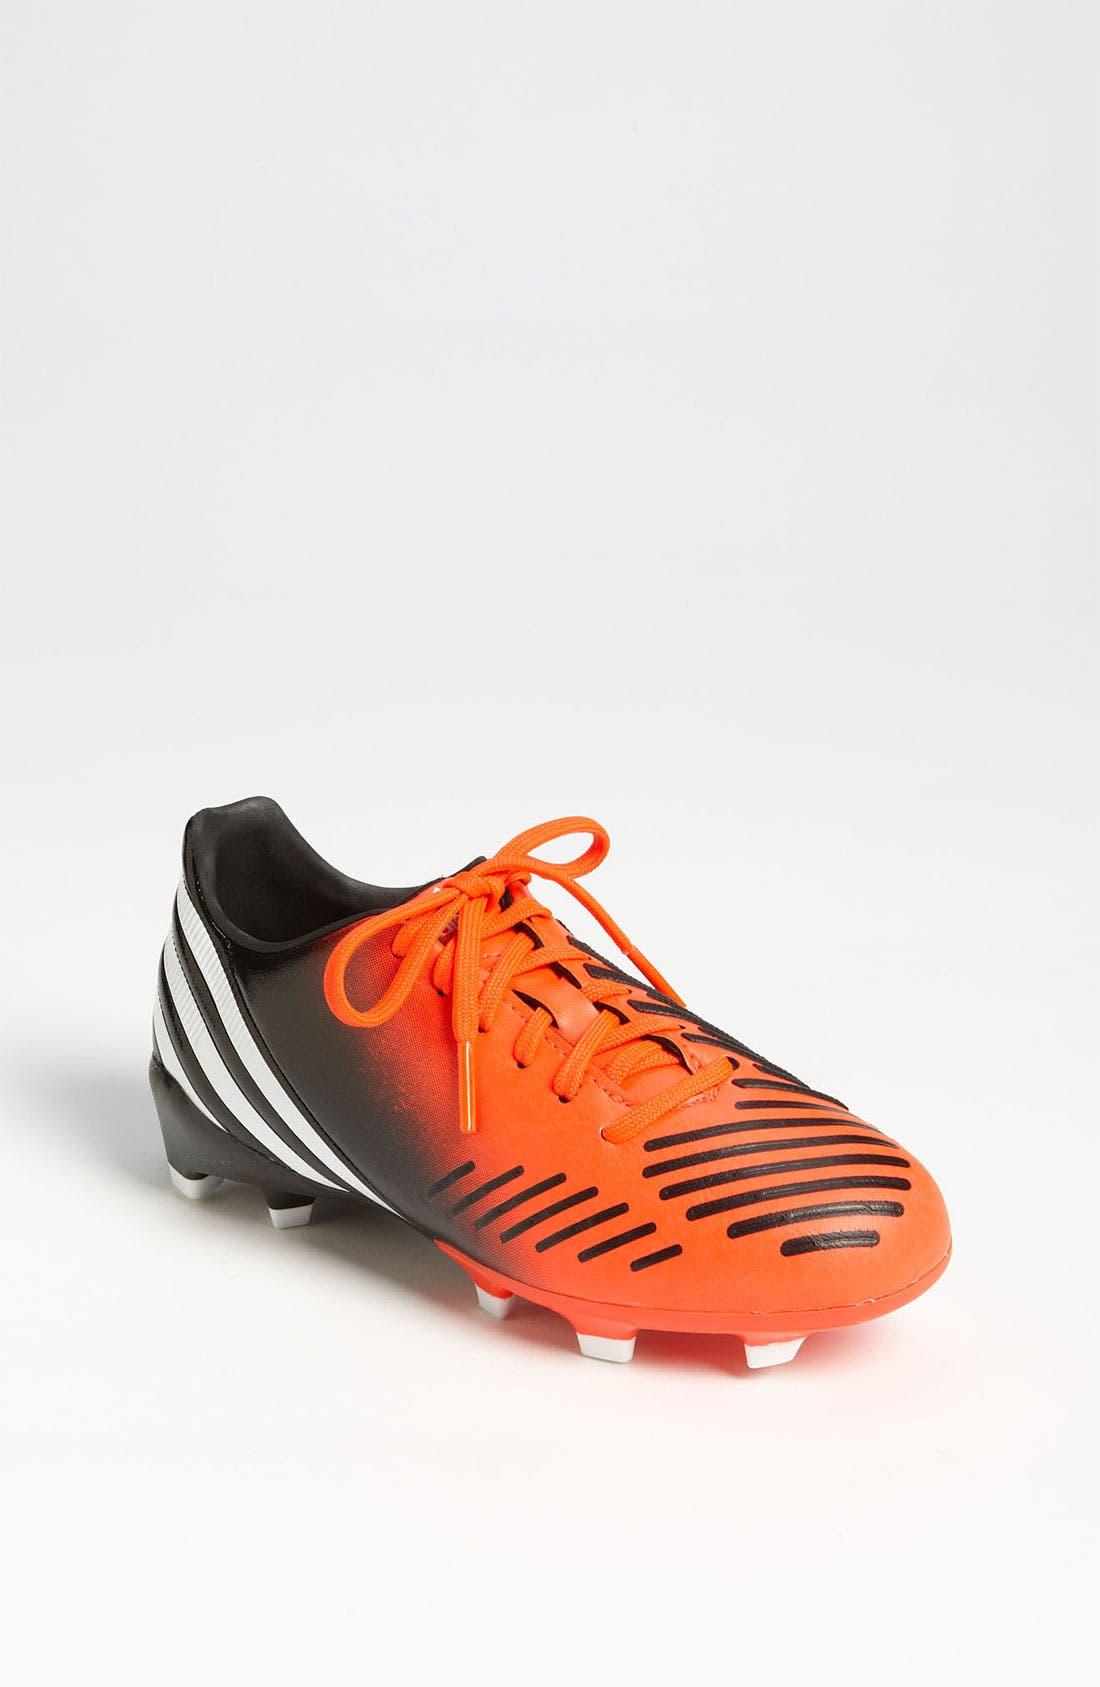 Alternate Image 1 Selected - adidas 'Predator Absolado LX TRX FG' Soccer Cleats (Toddler, Little Kid & Big Kid)